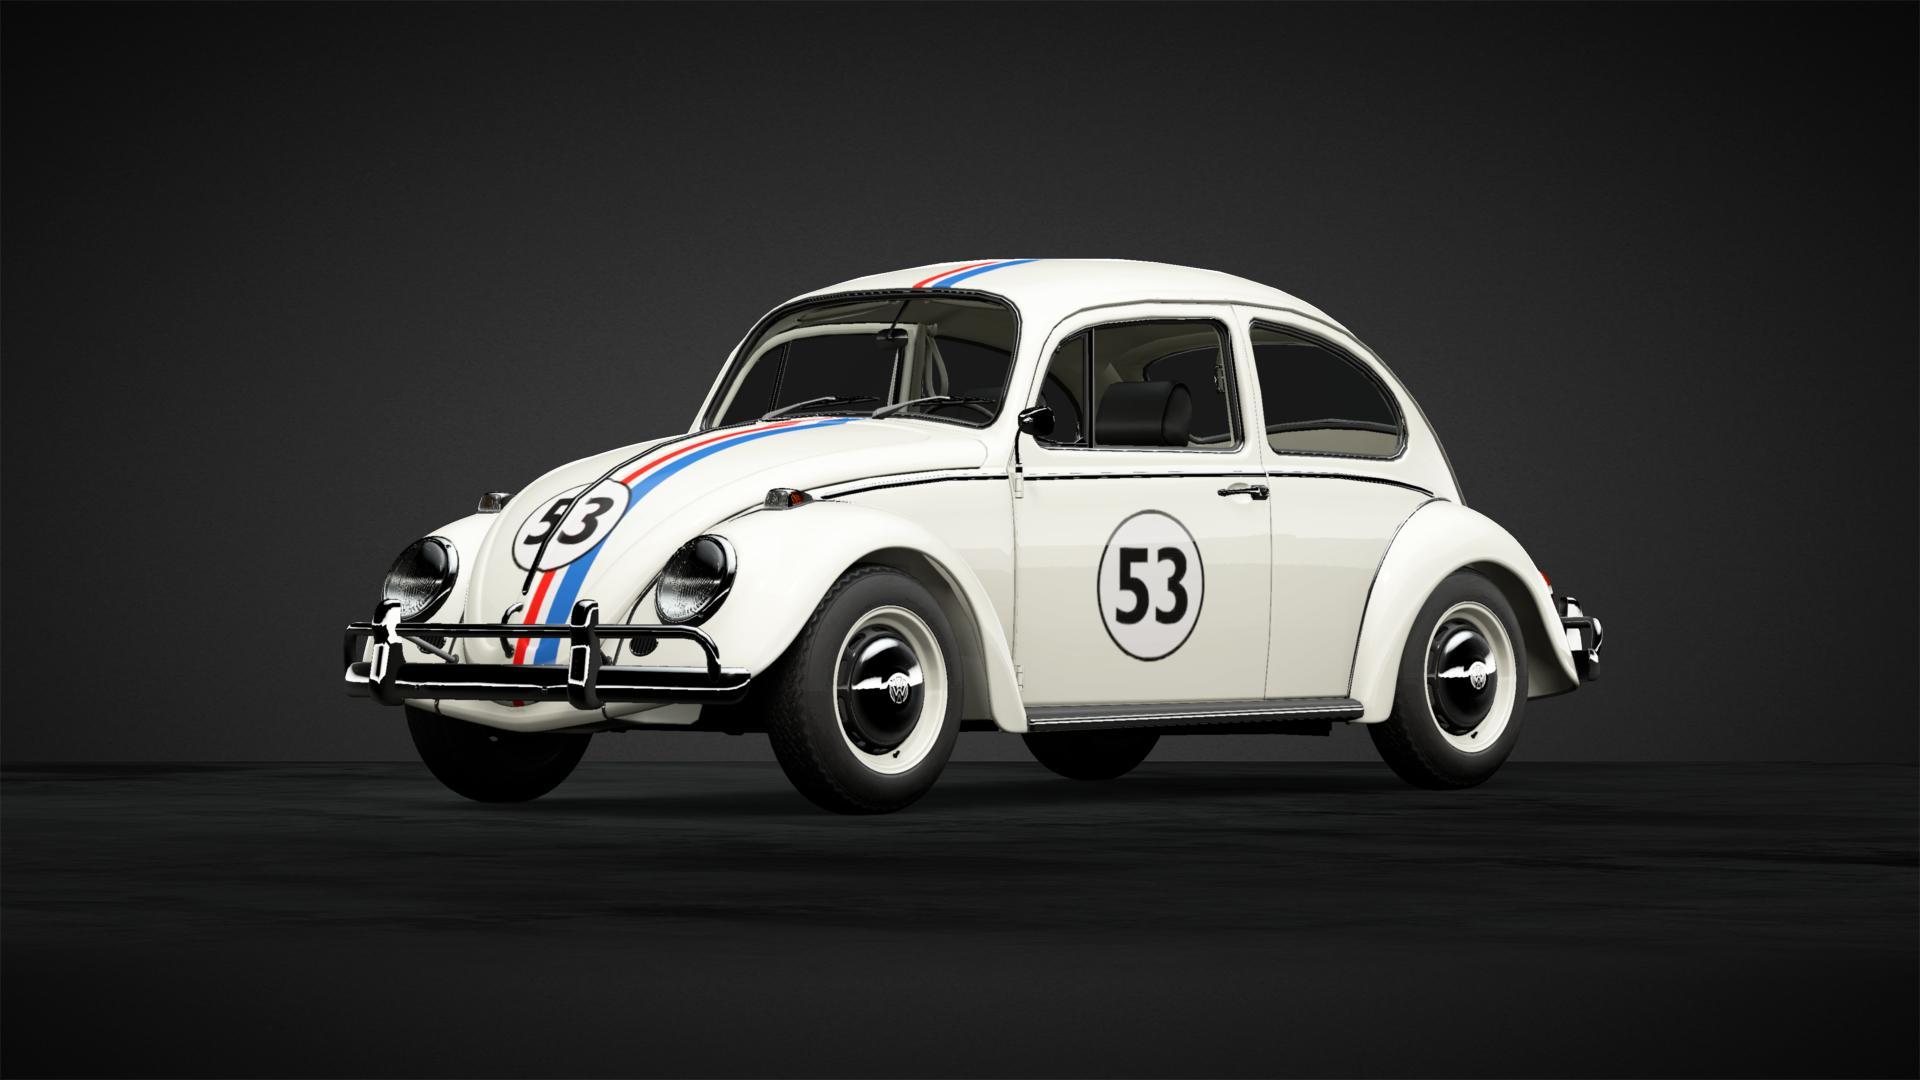 Herbie Car Livery By Pinneroldshoe Community Gran Turismo Sport